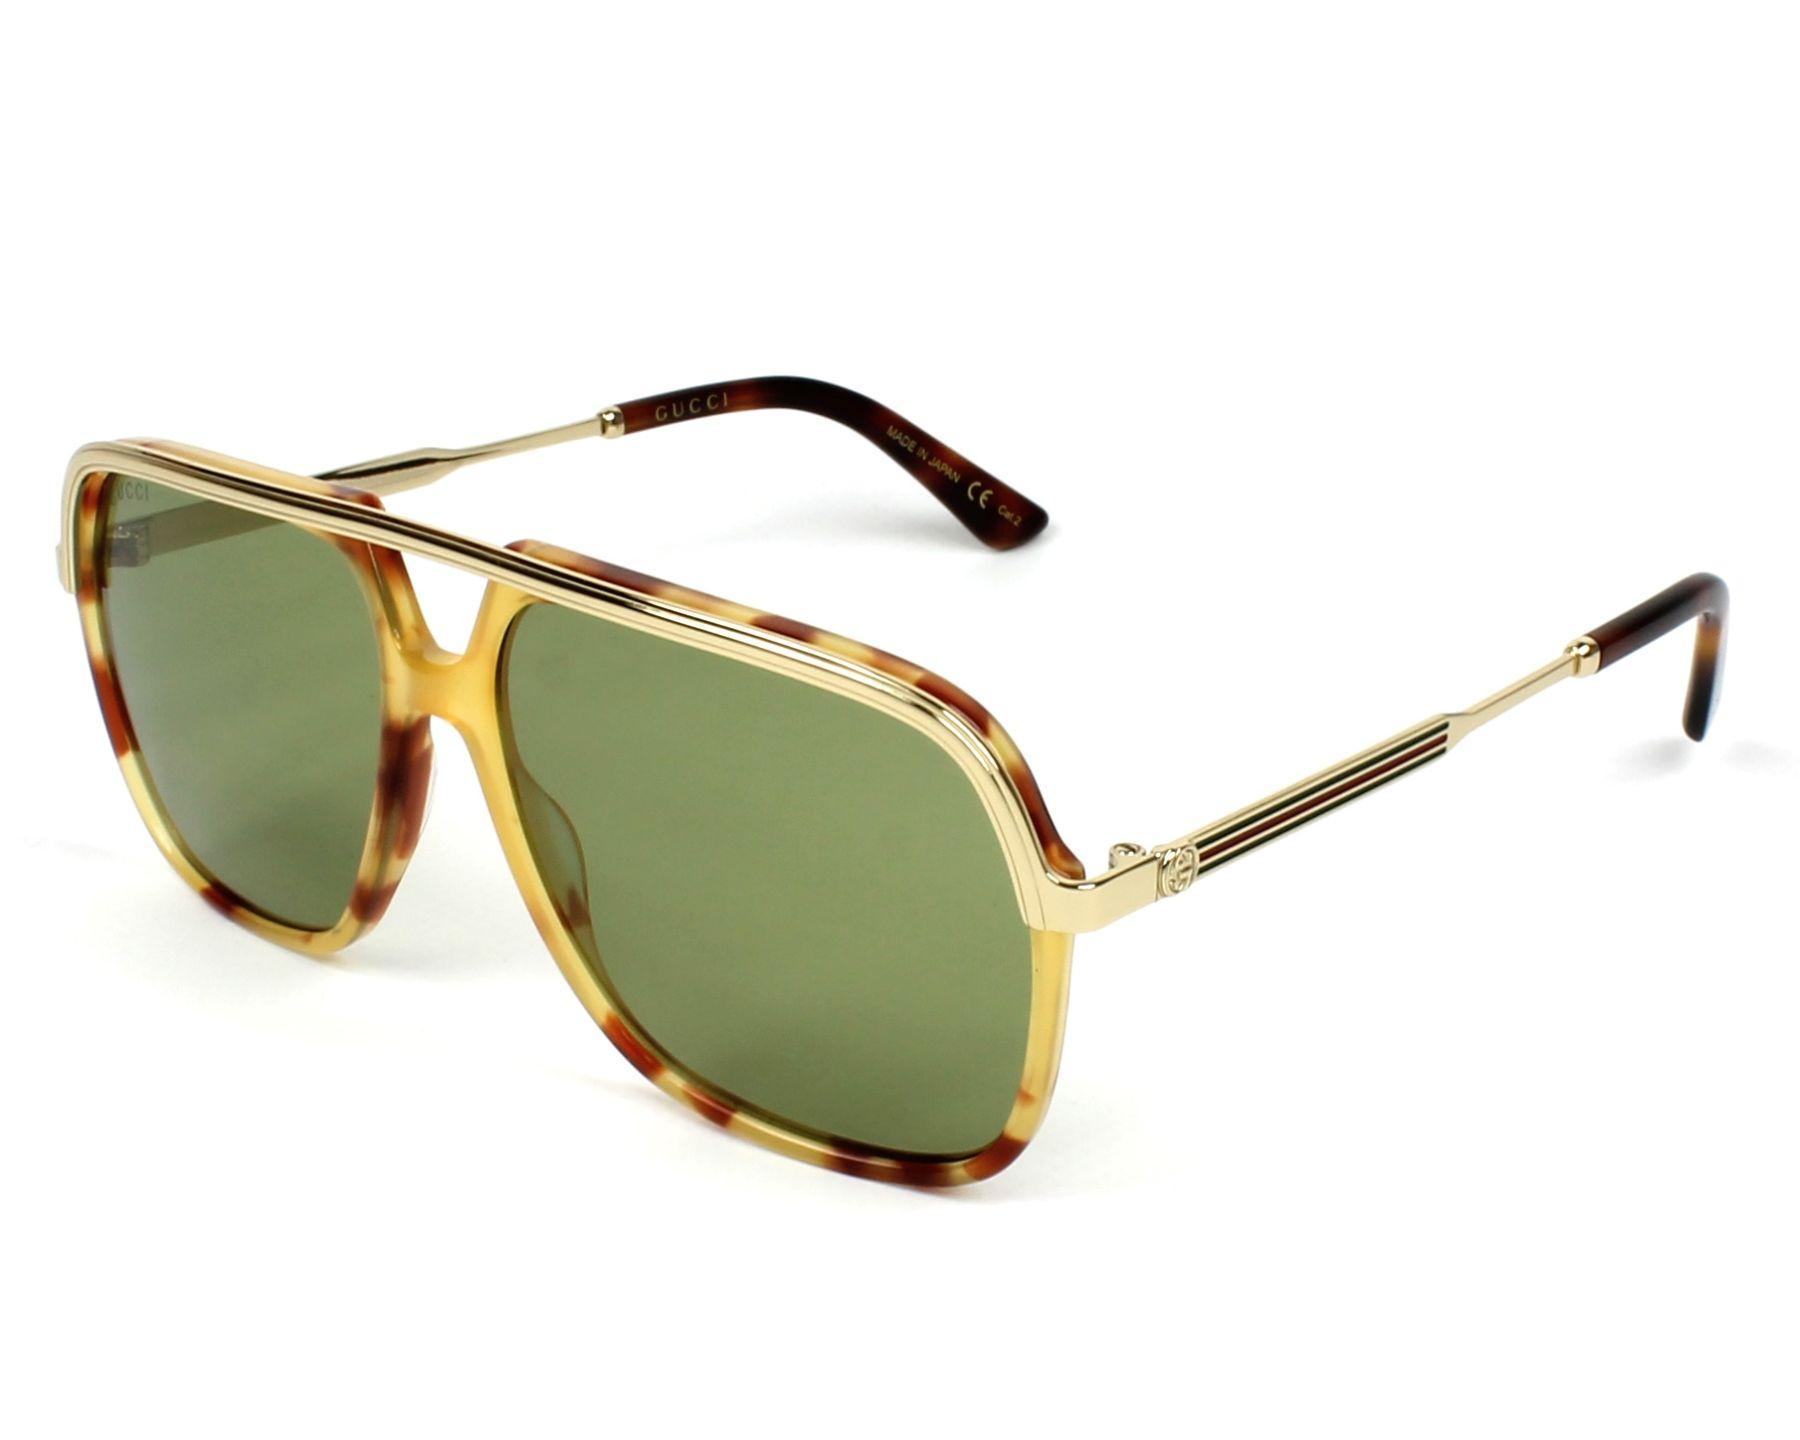 220b5edafbe49 Sunglasses Gucci GG-0200-S 003 57-14 Havana Gold profile view